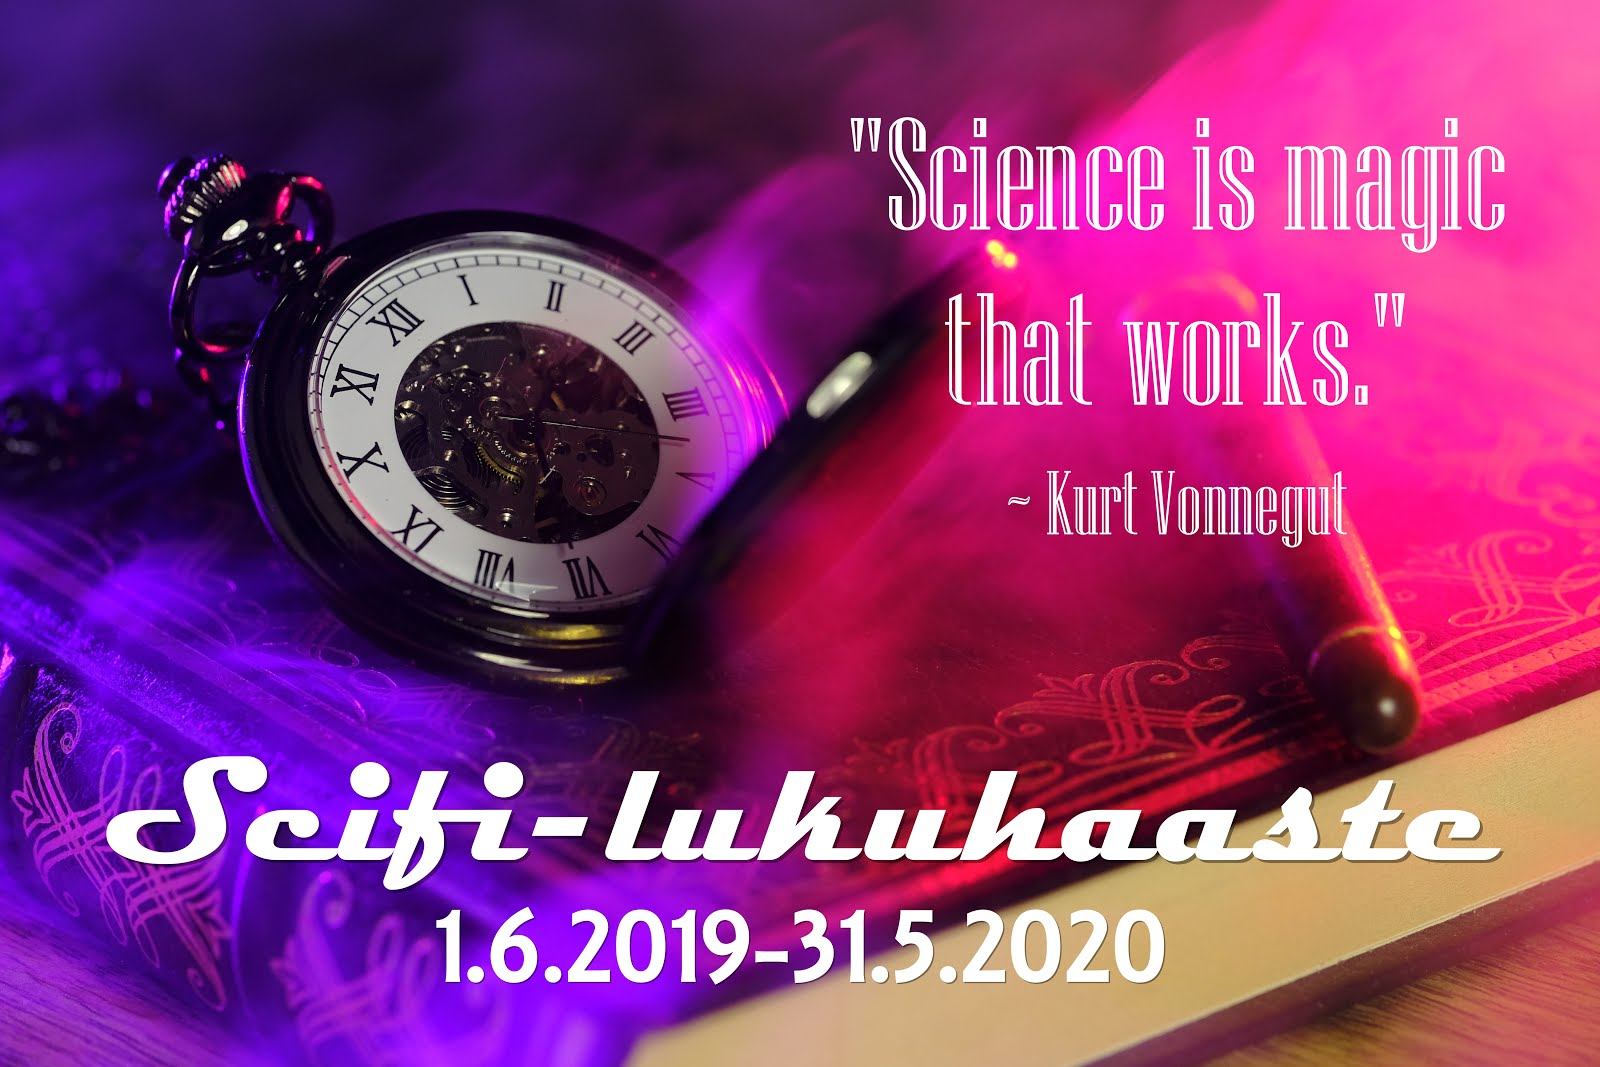 Scifi-lukuhaaste (1.6.2019 - 31.5.2020)